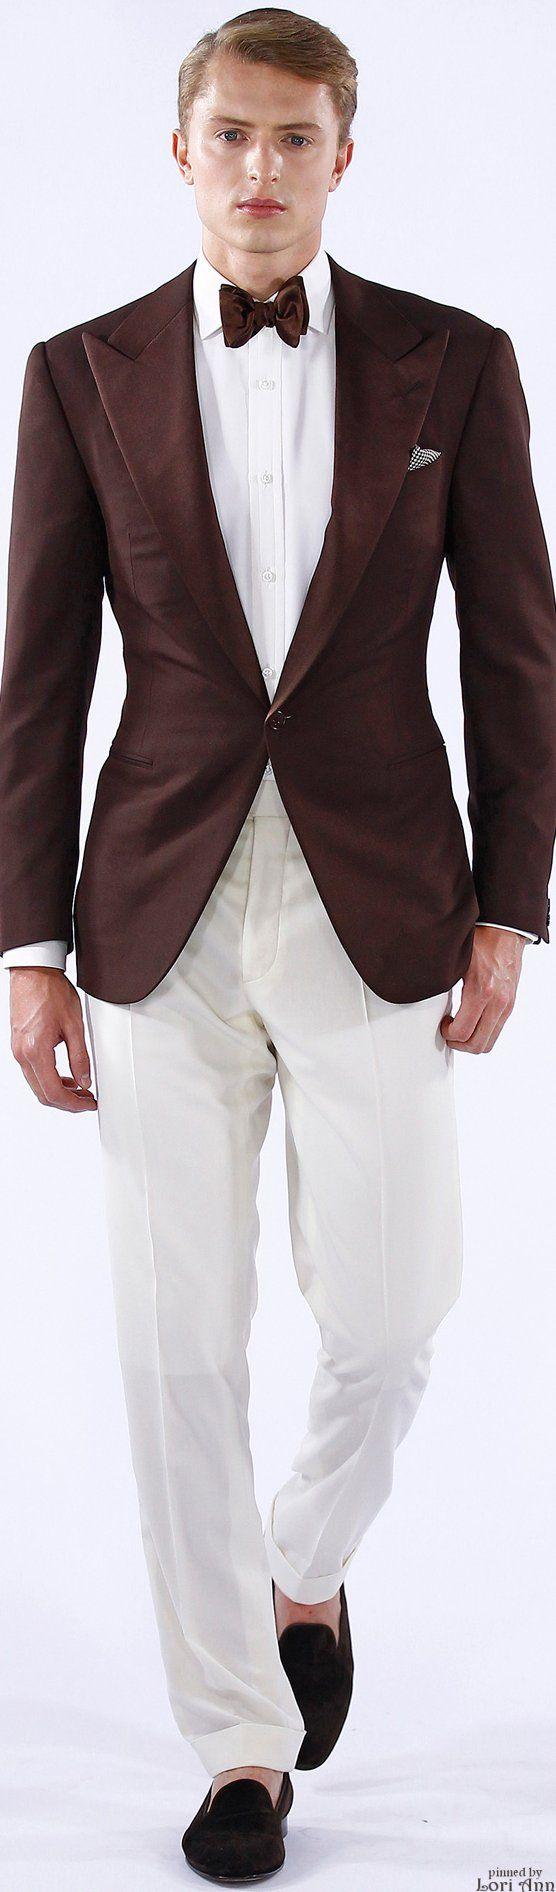 Popular One Button Groomsmen Peak Lapel Groom Tuxedos Groomsmen Best Man Suit Mens Wedding Suits Bridegroom (Jacket+Pants+Tie) B598